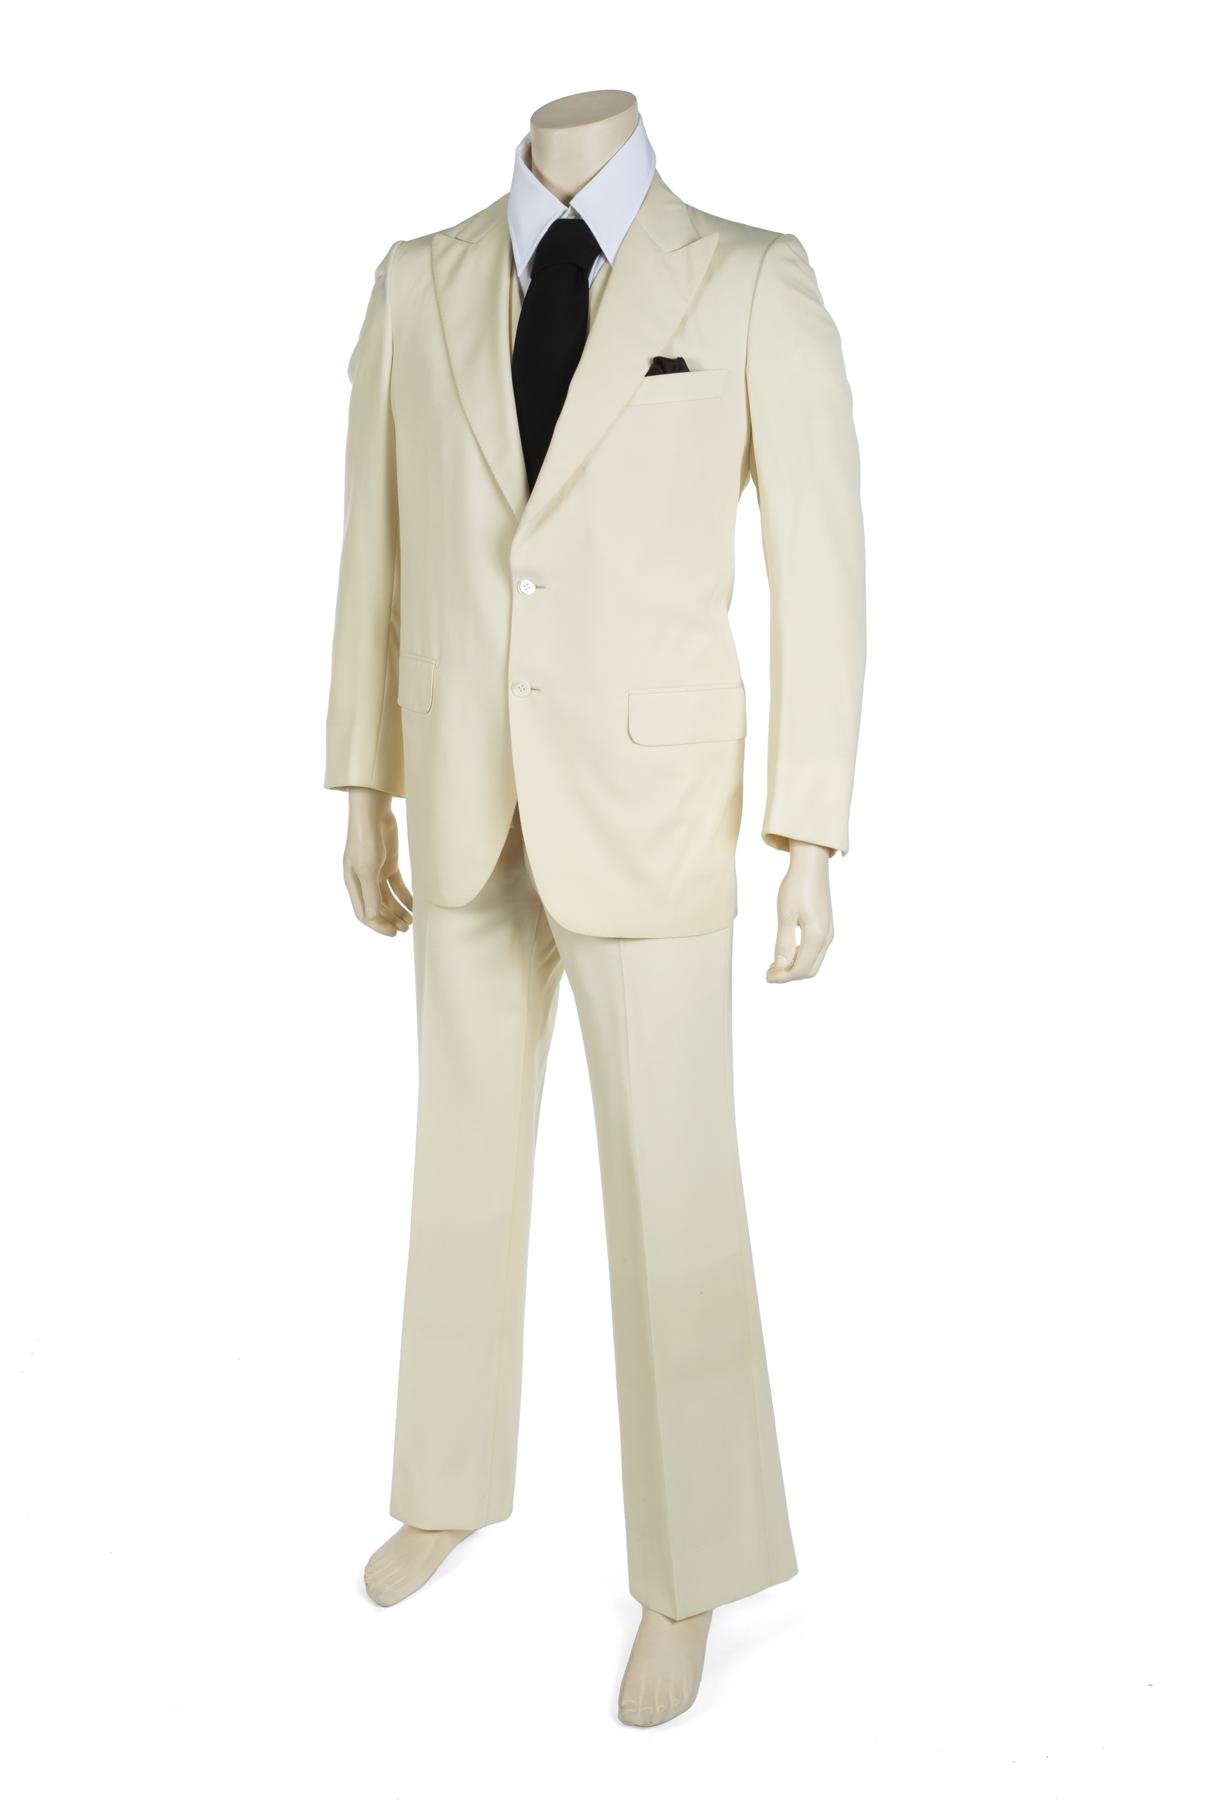 Steve Martin suit